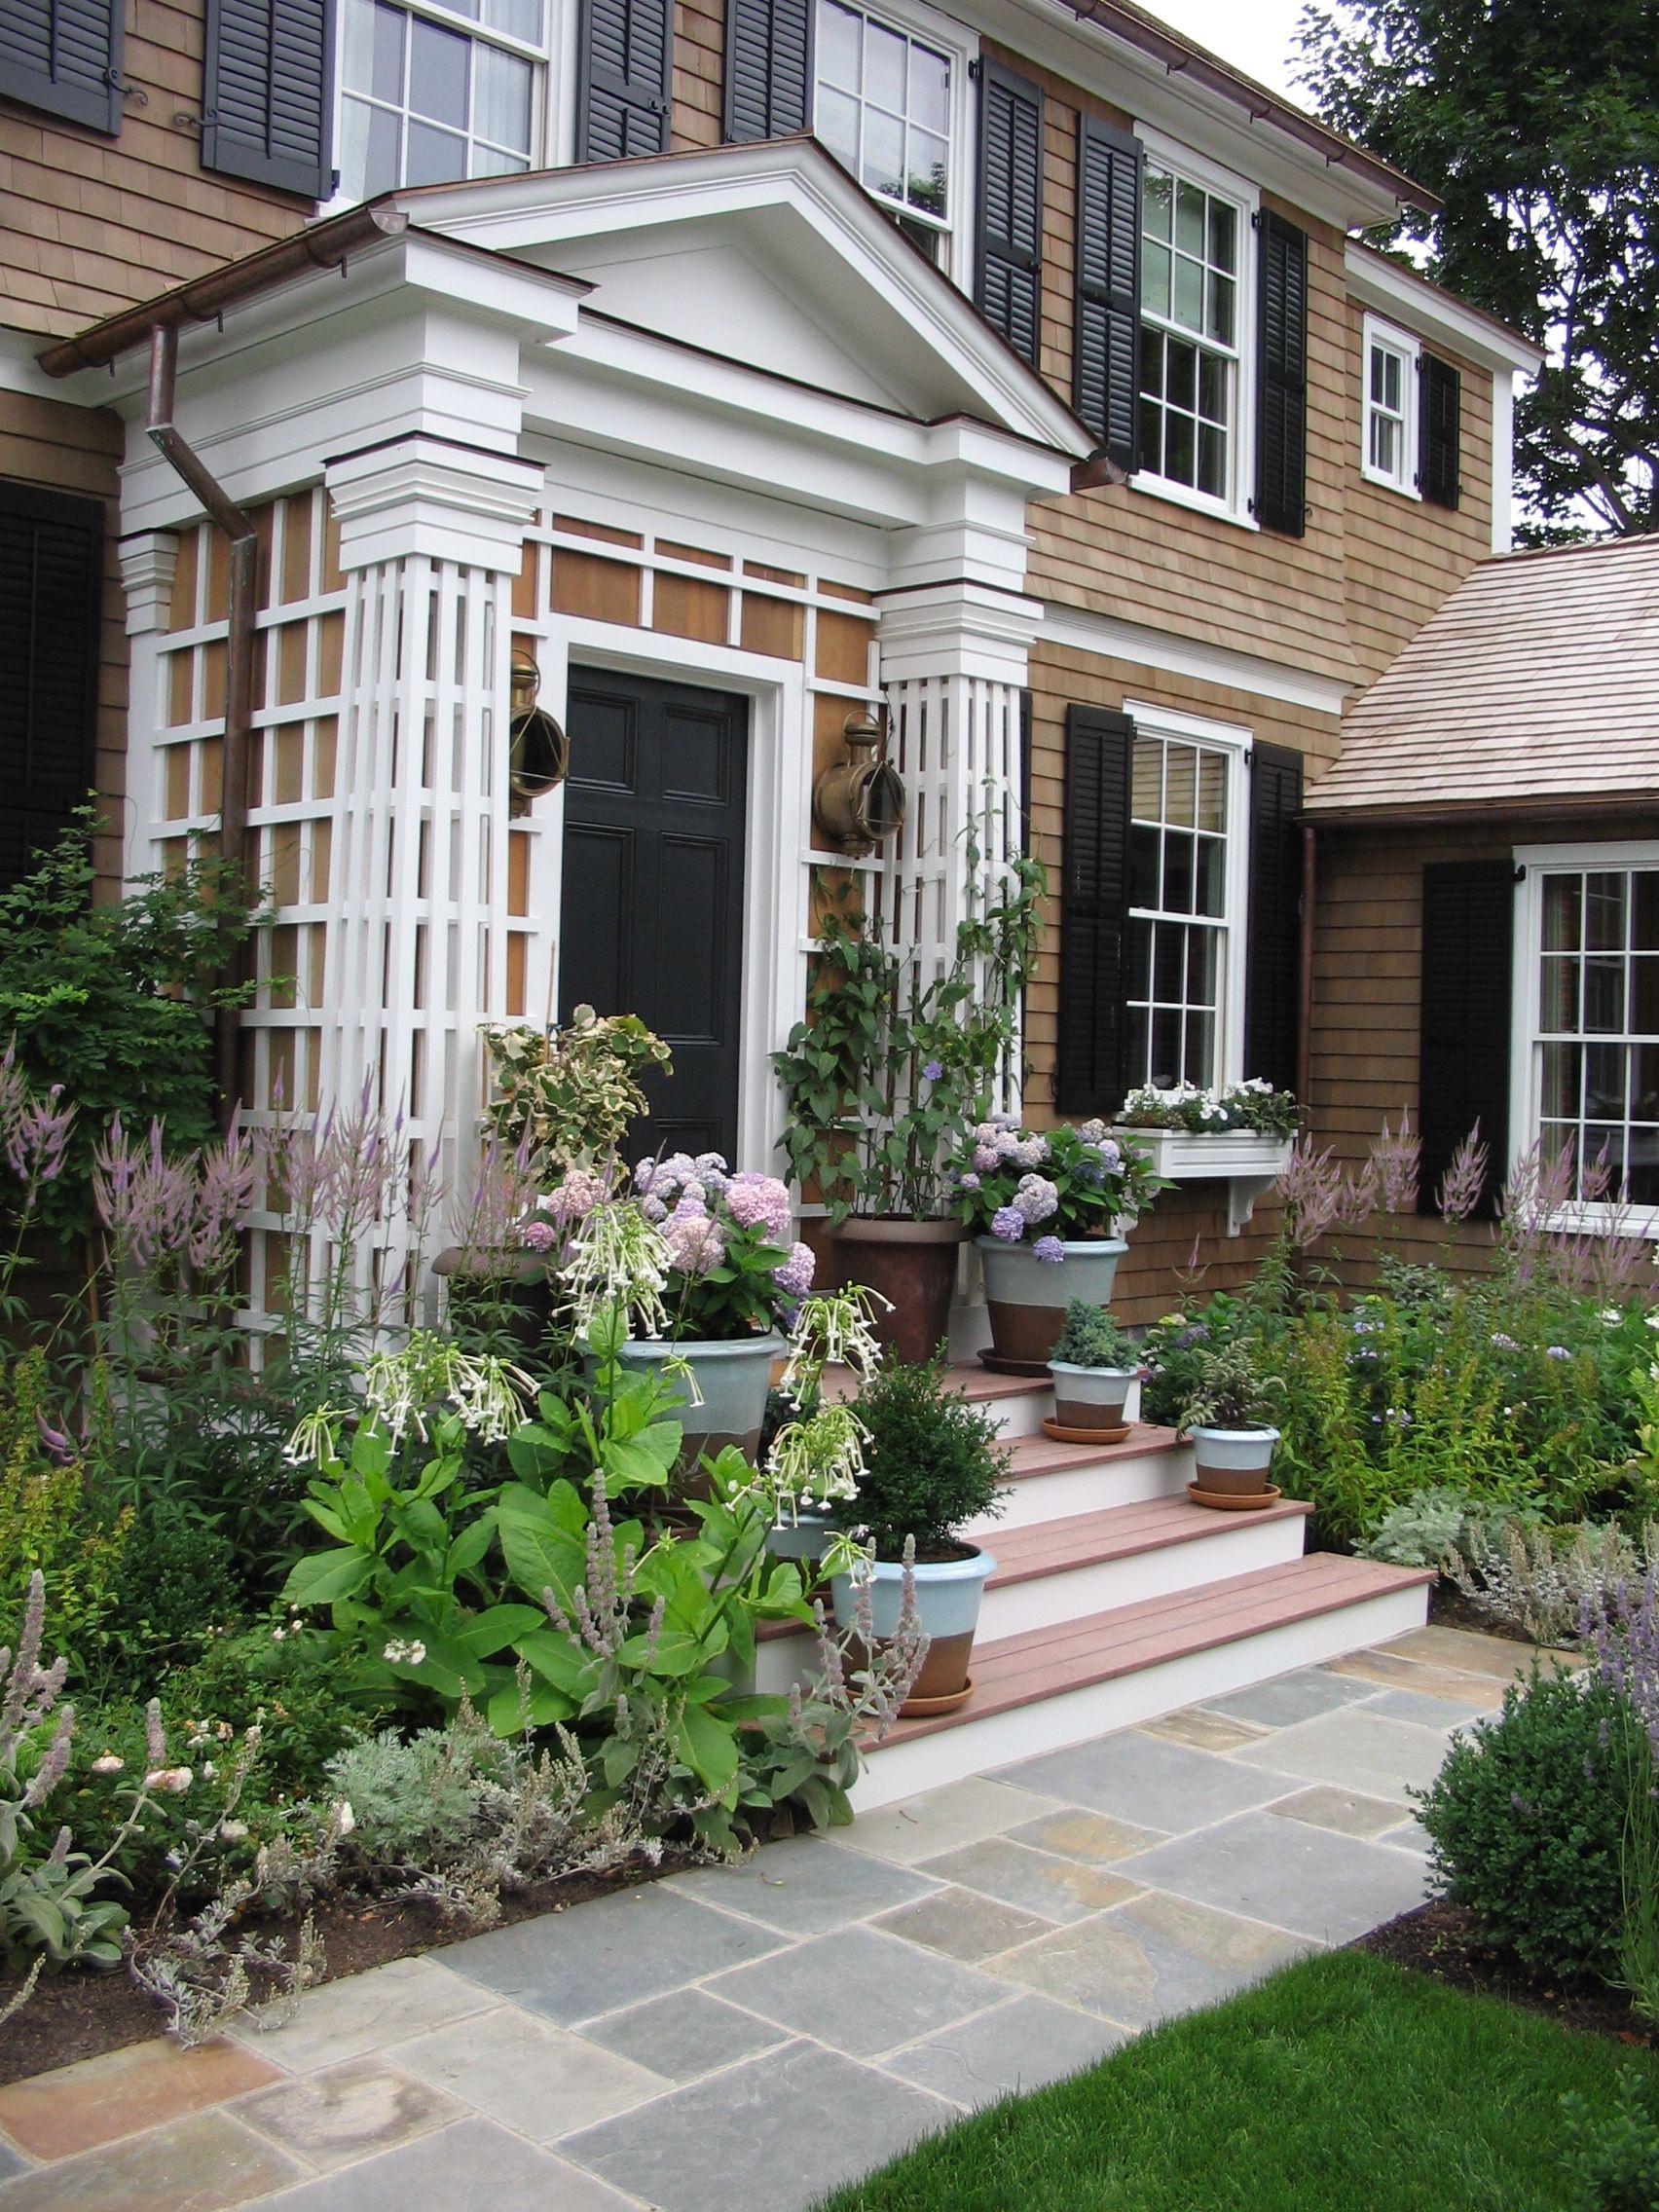 Lovely P Allen Smith Home Design Part - 11: From P. Allen Smith U0026 Associates